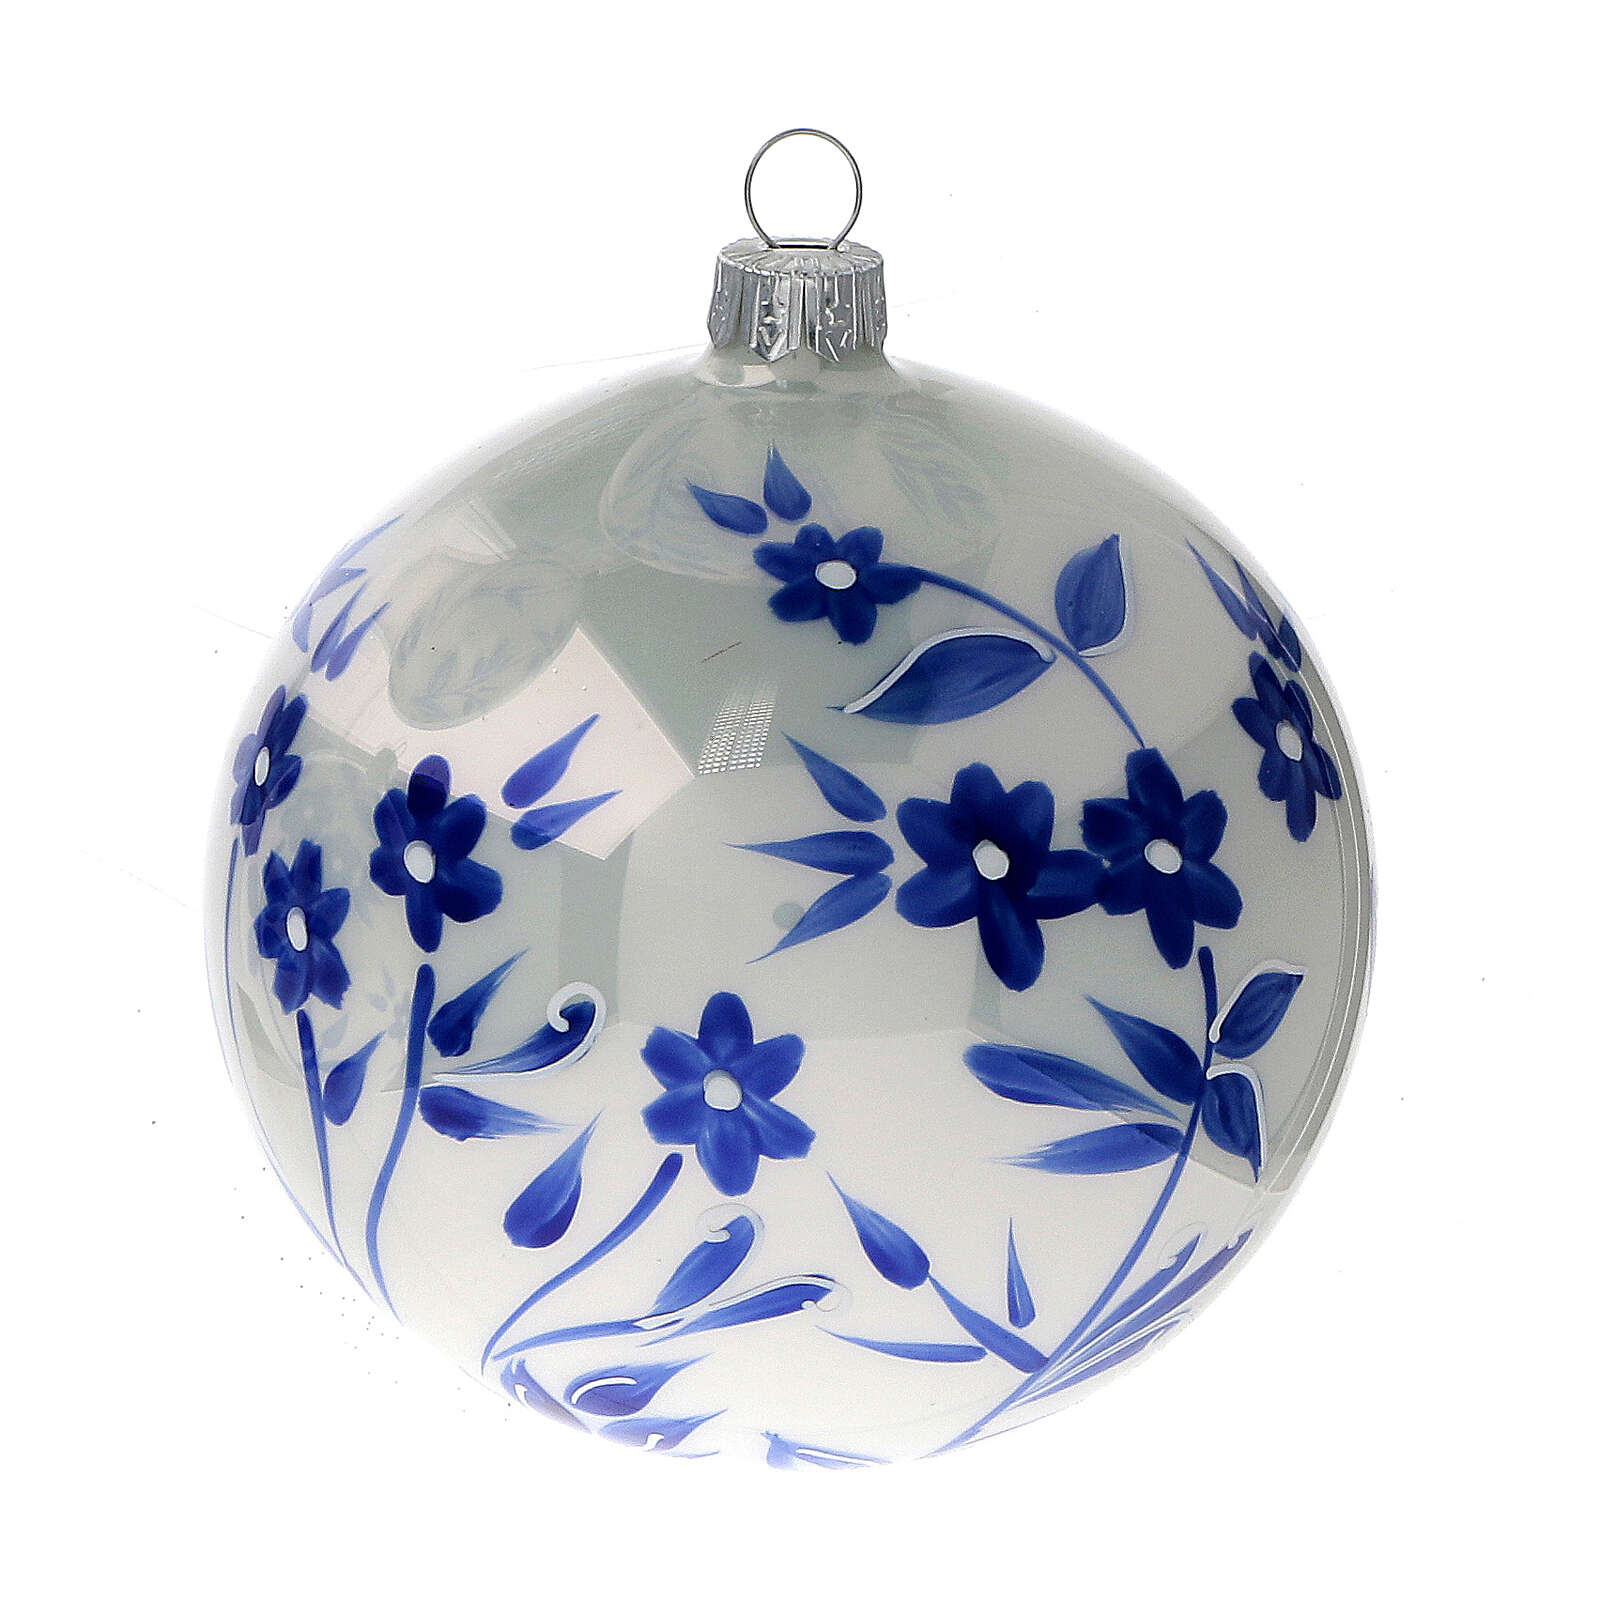 Bolas árvore de Natal vidro soprado branco com flores estilizadas azuis 100 mm 4 unidades 4